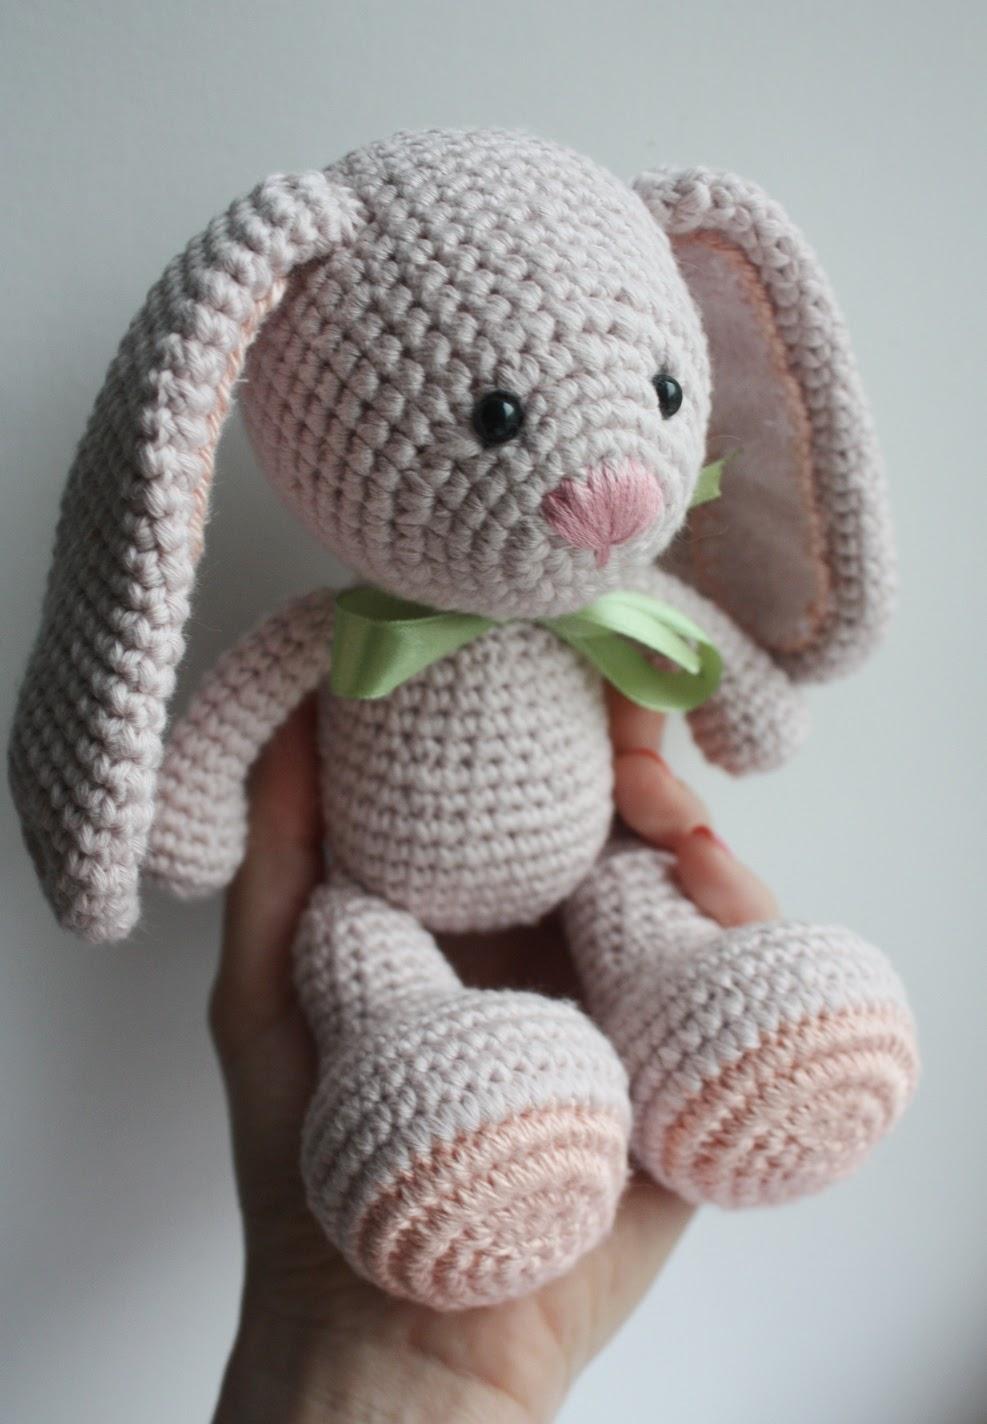 Happyamigurumi New Design In Process Little Amigurumi Bunny-7484